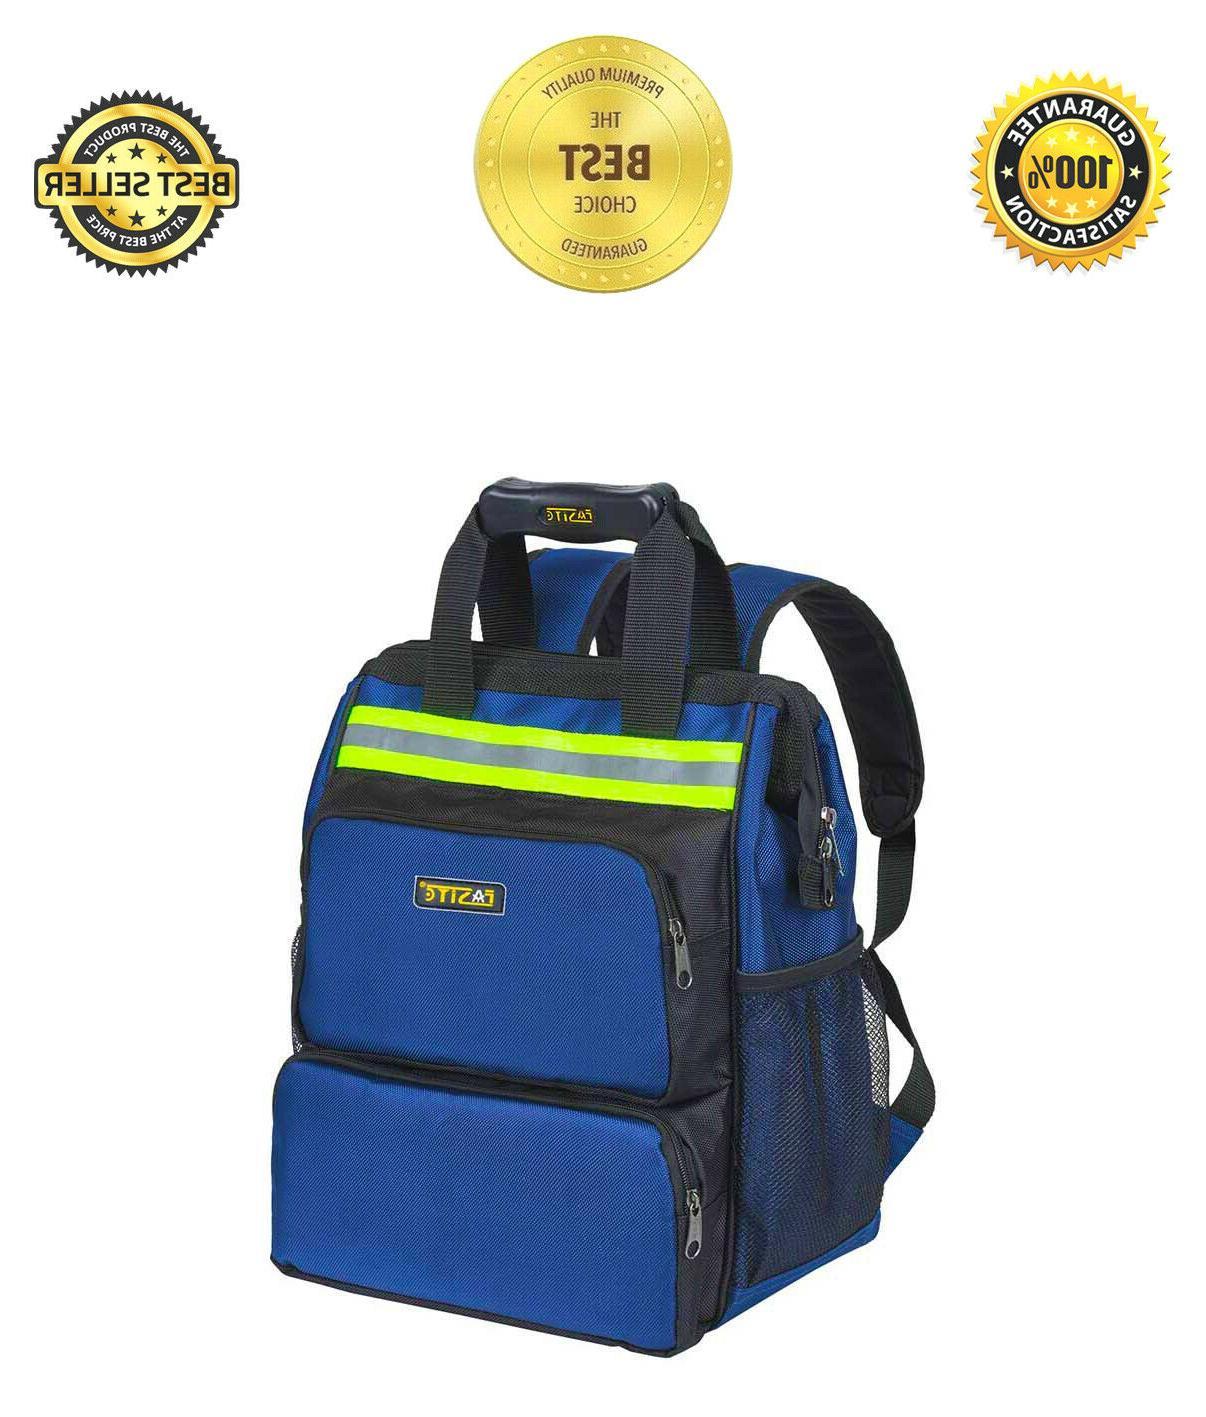 Tool Backpack Organizer Bag Many Pockets Back Pro